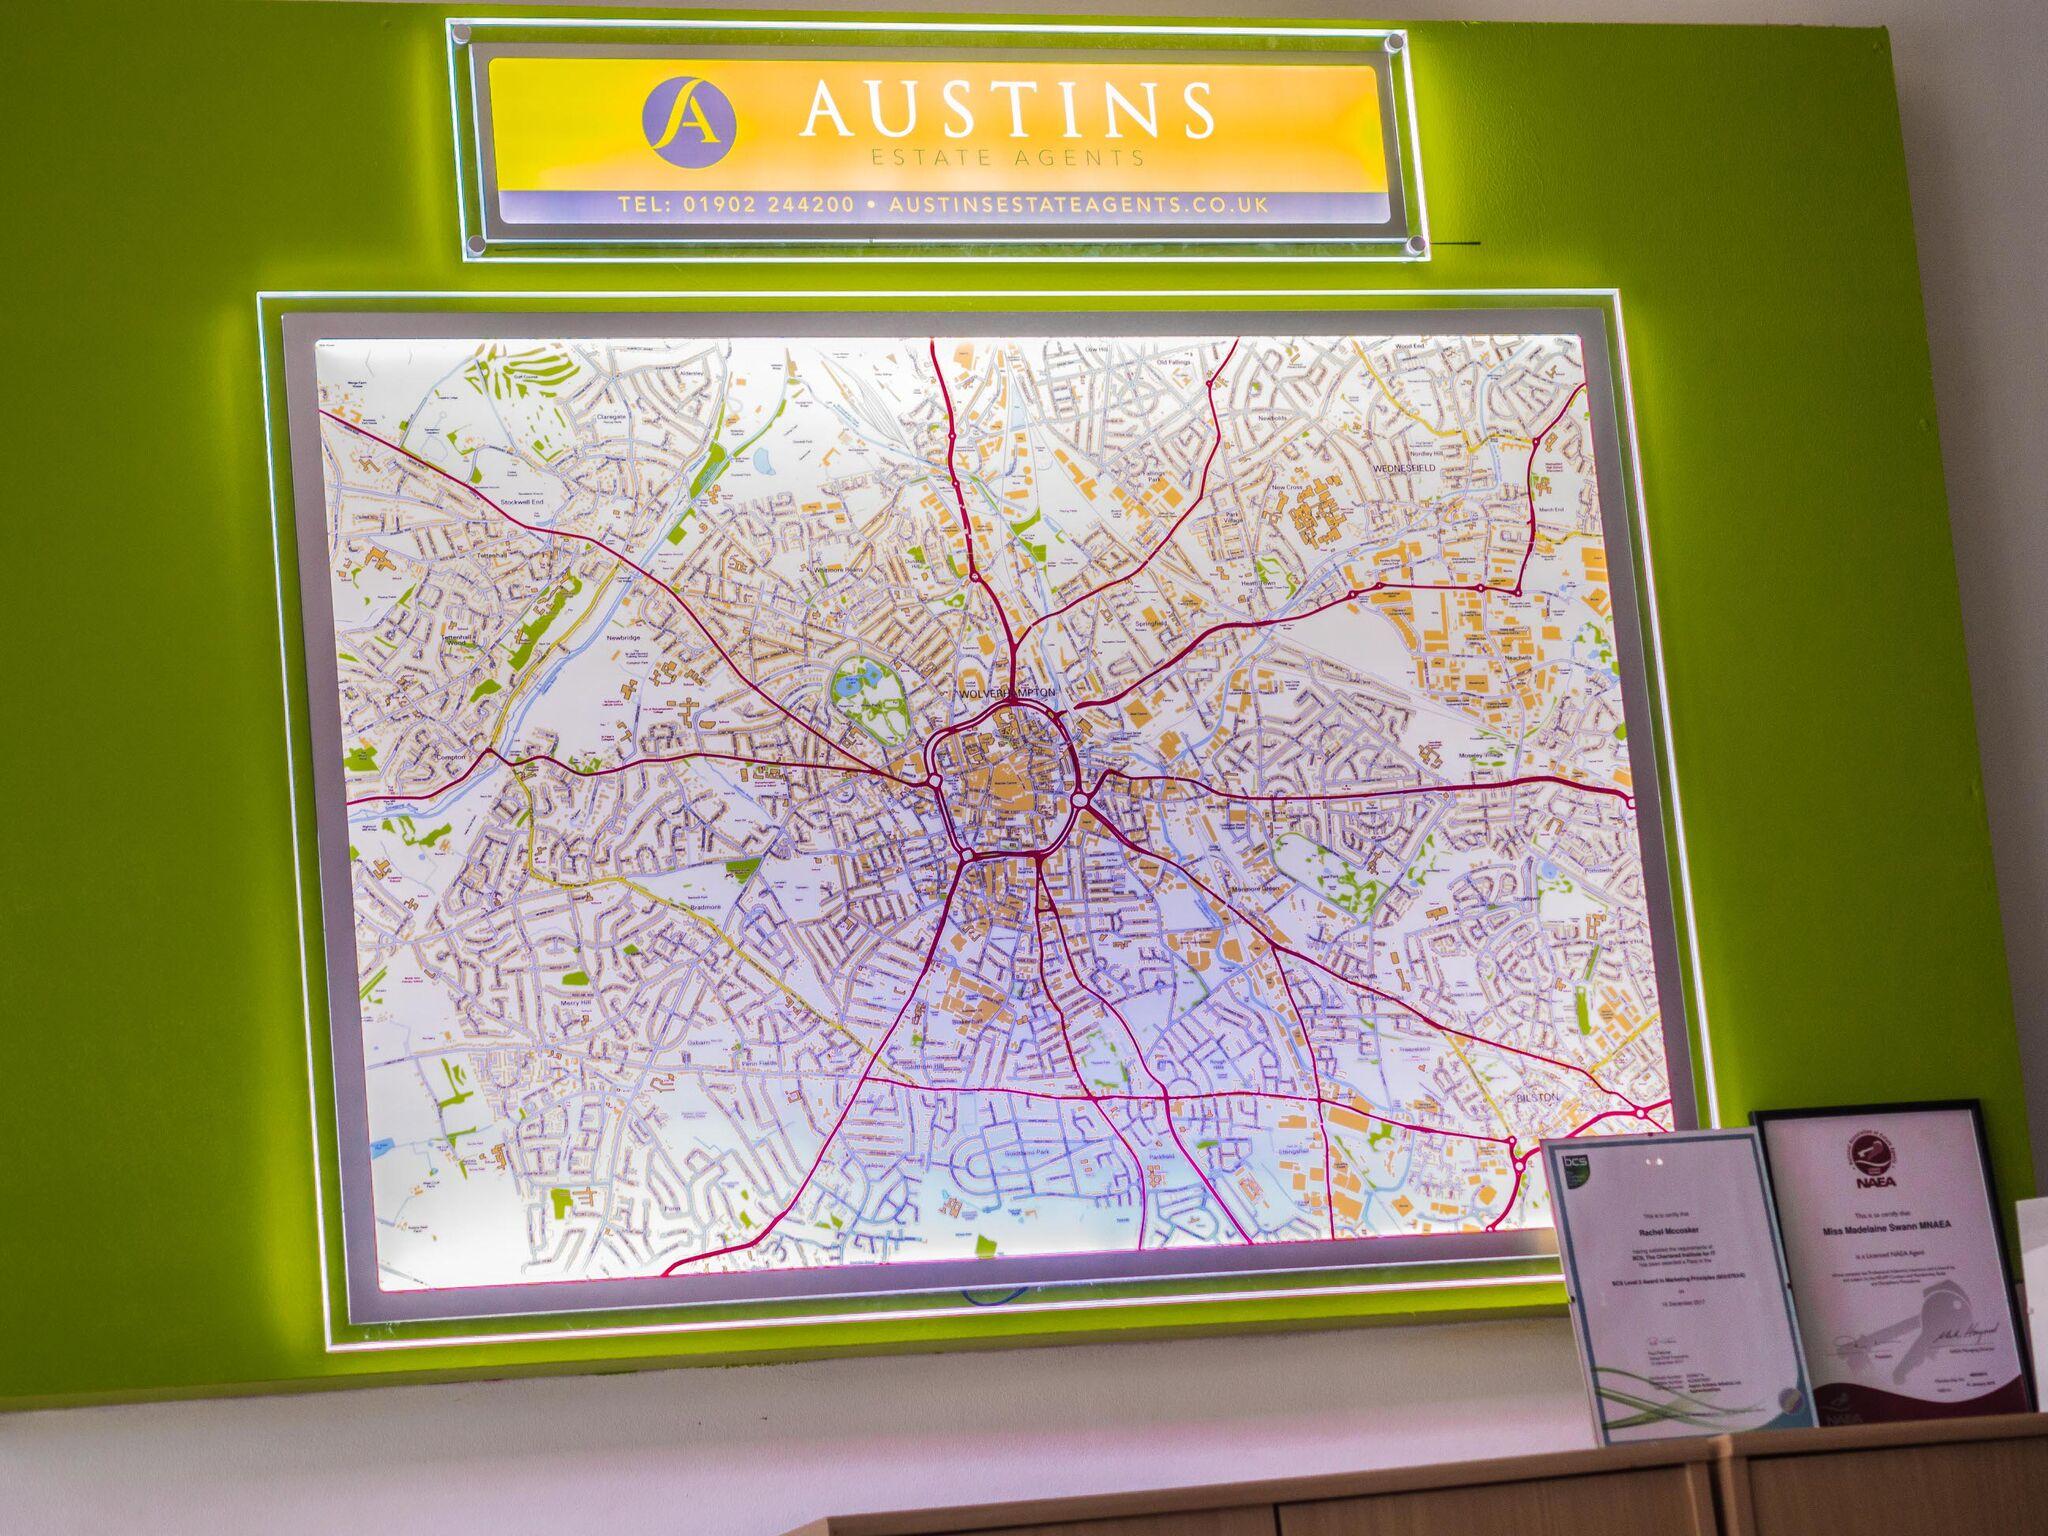 Promotional Image - Austins Estate Agents